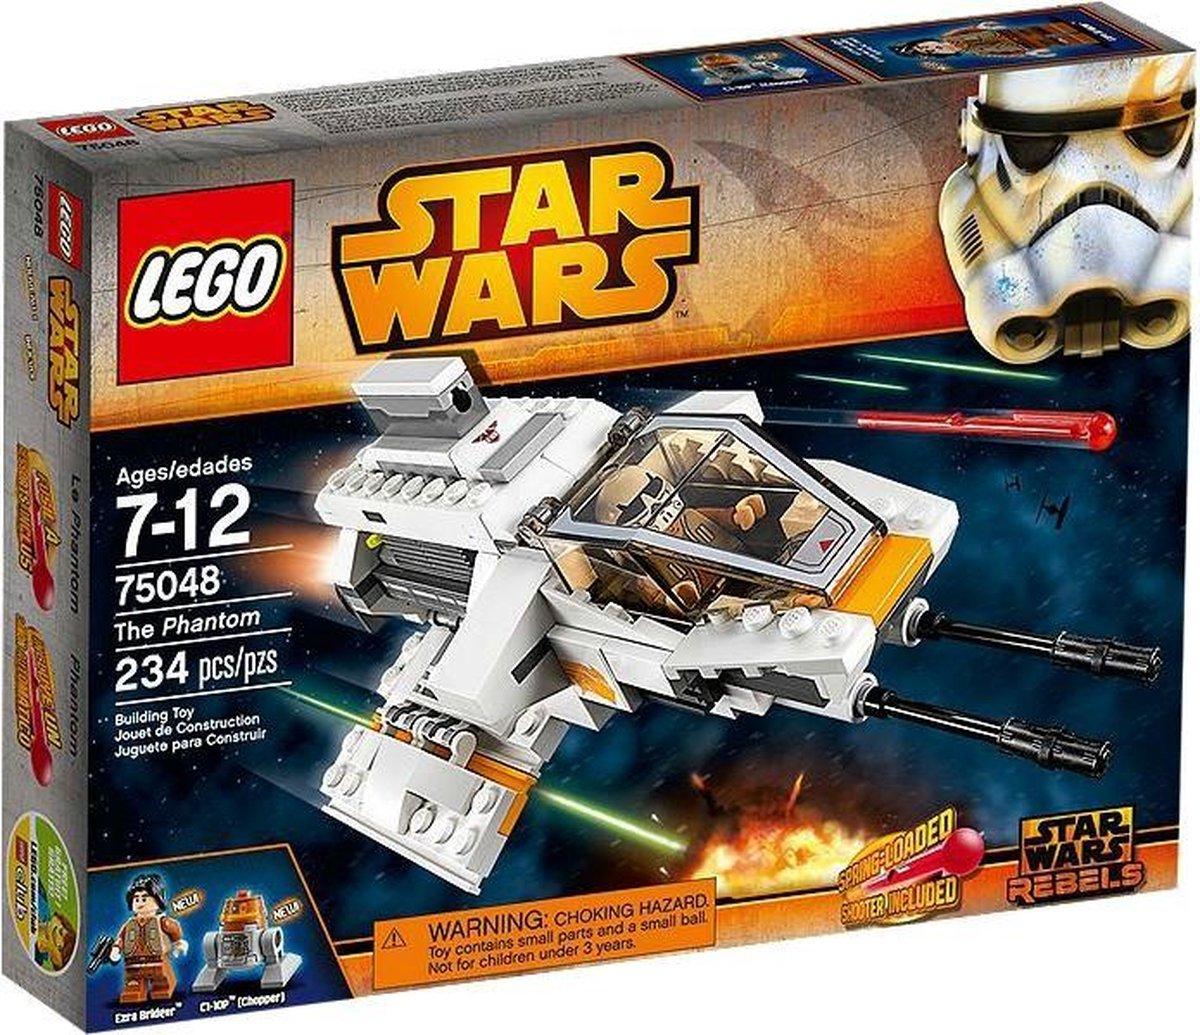 LEGO Star Wars De Phantom - 75048